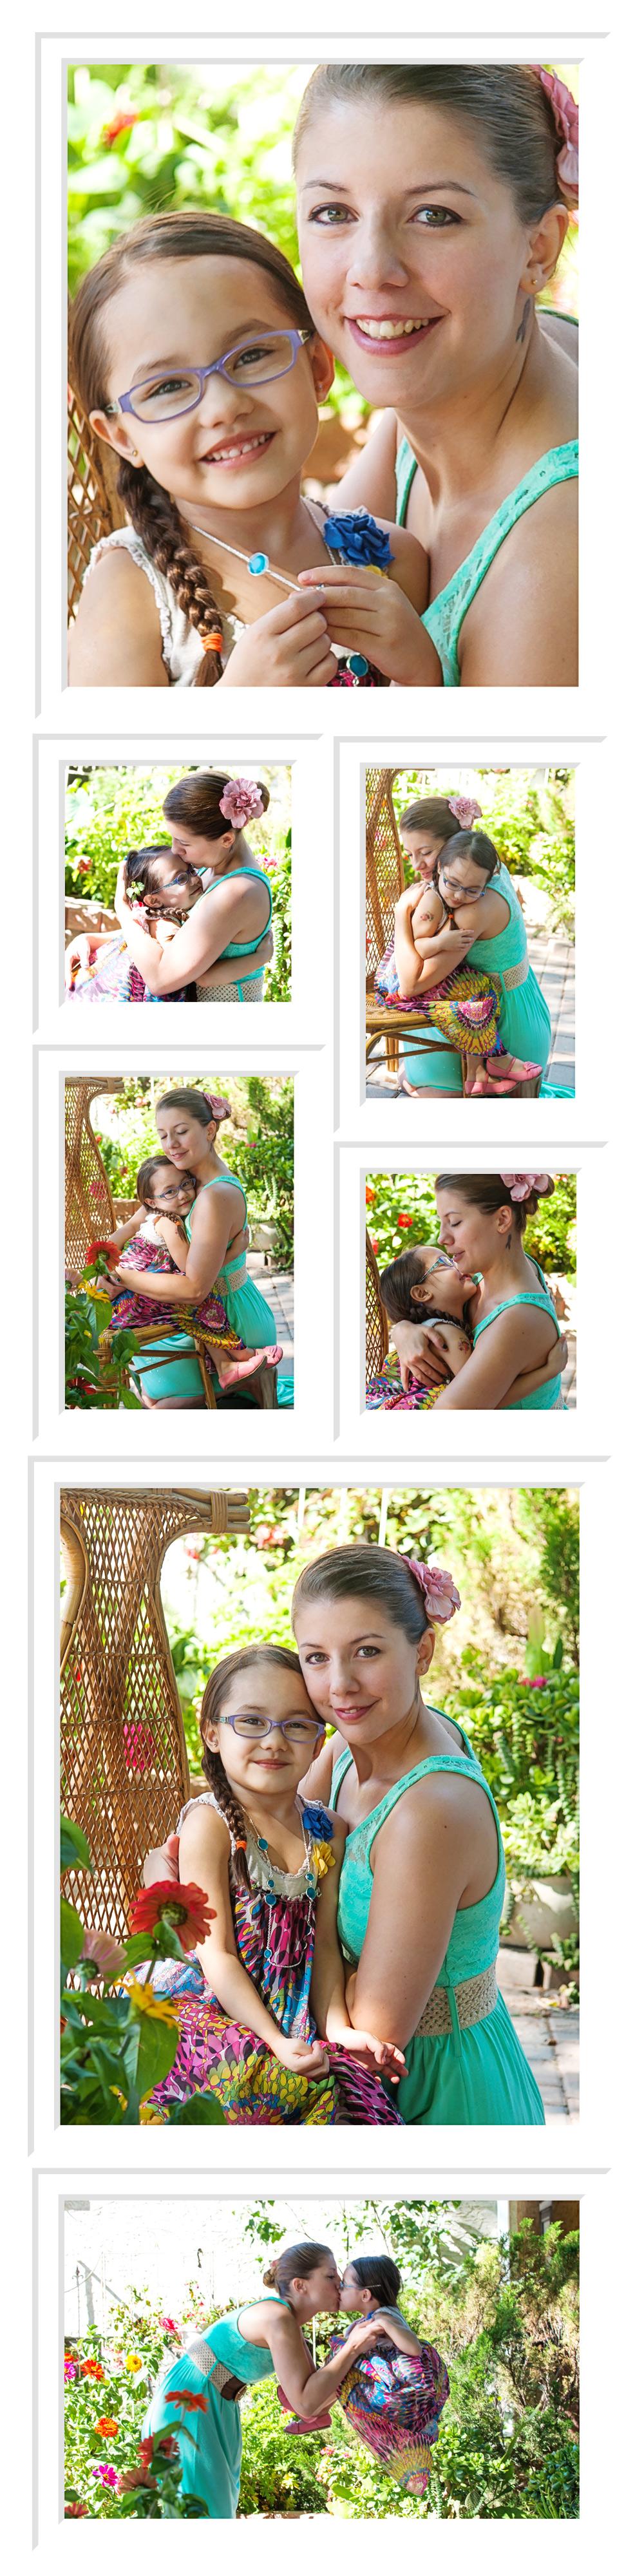 love-you-mommy-free-lense-photo.jpg